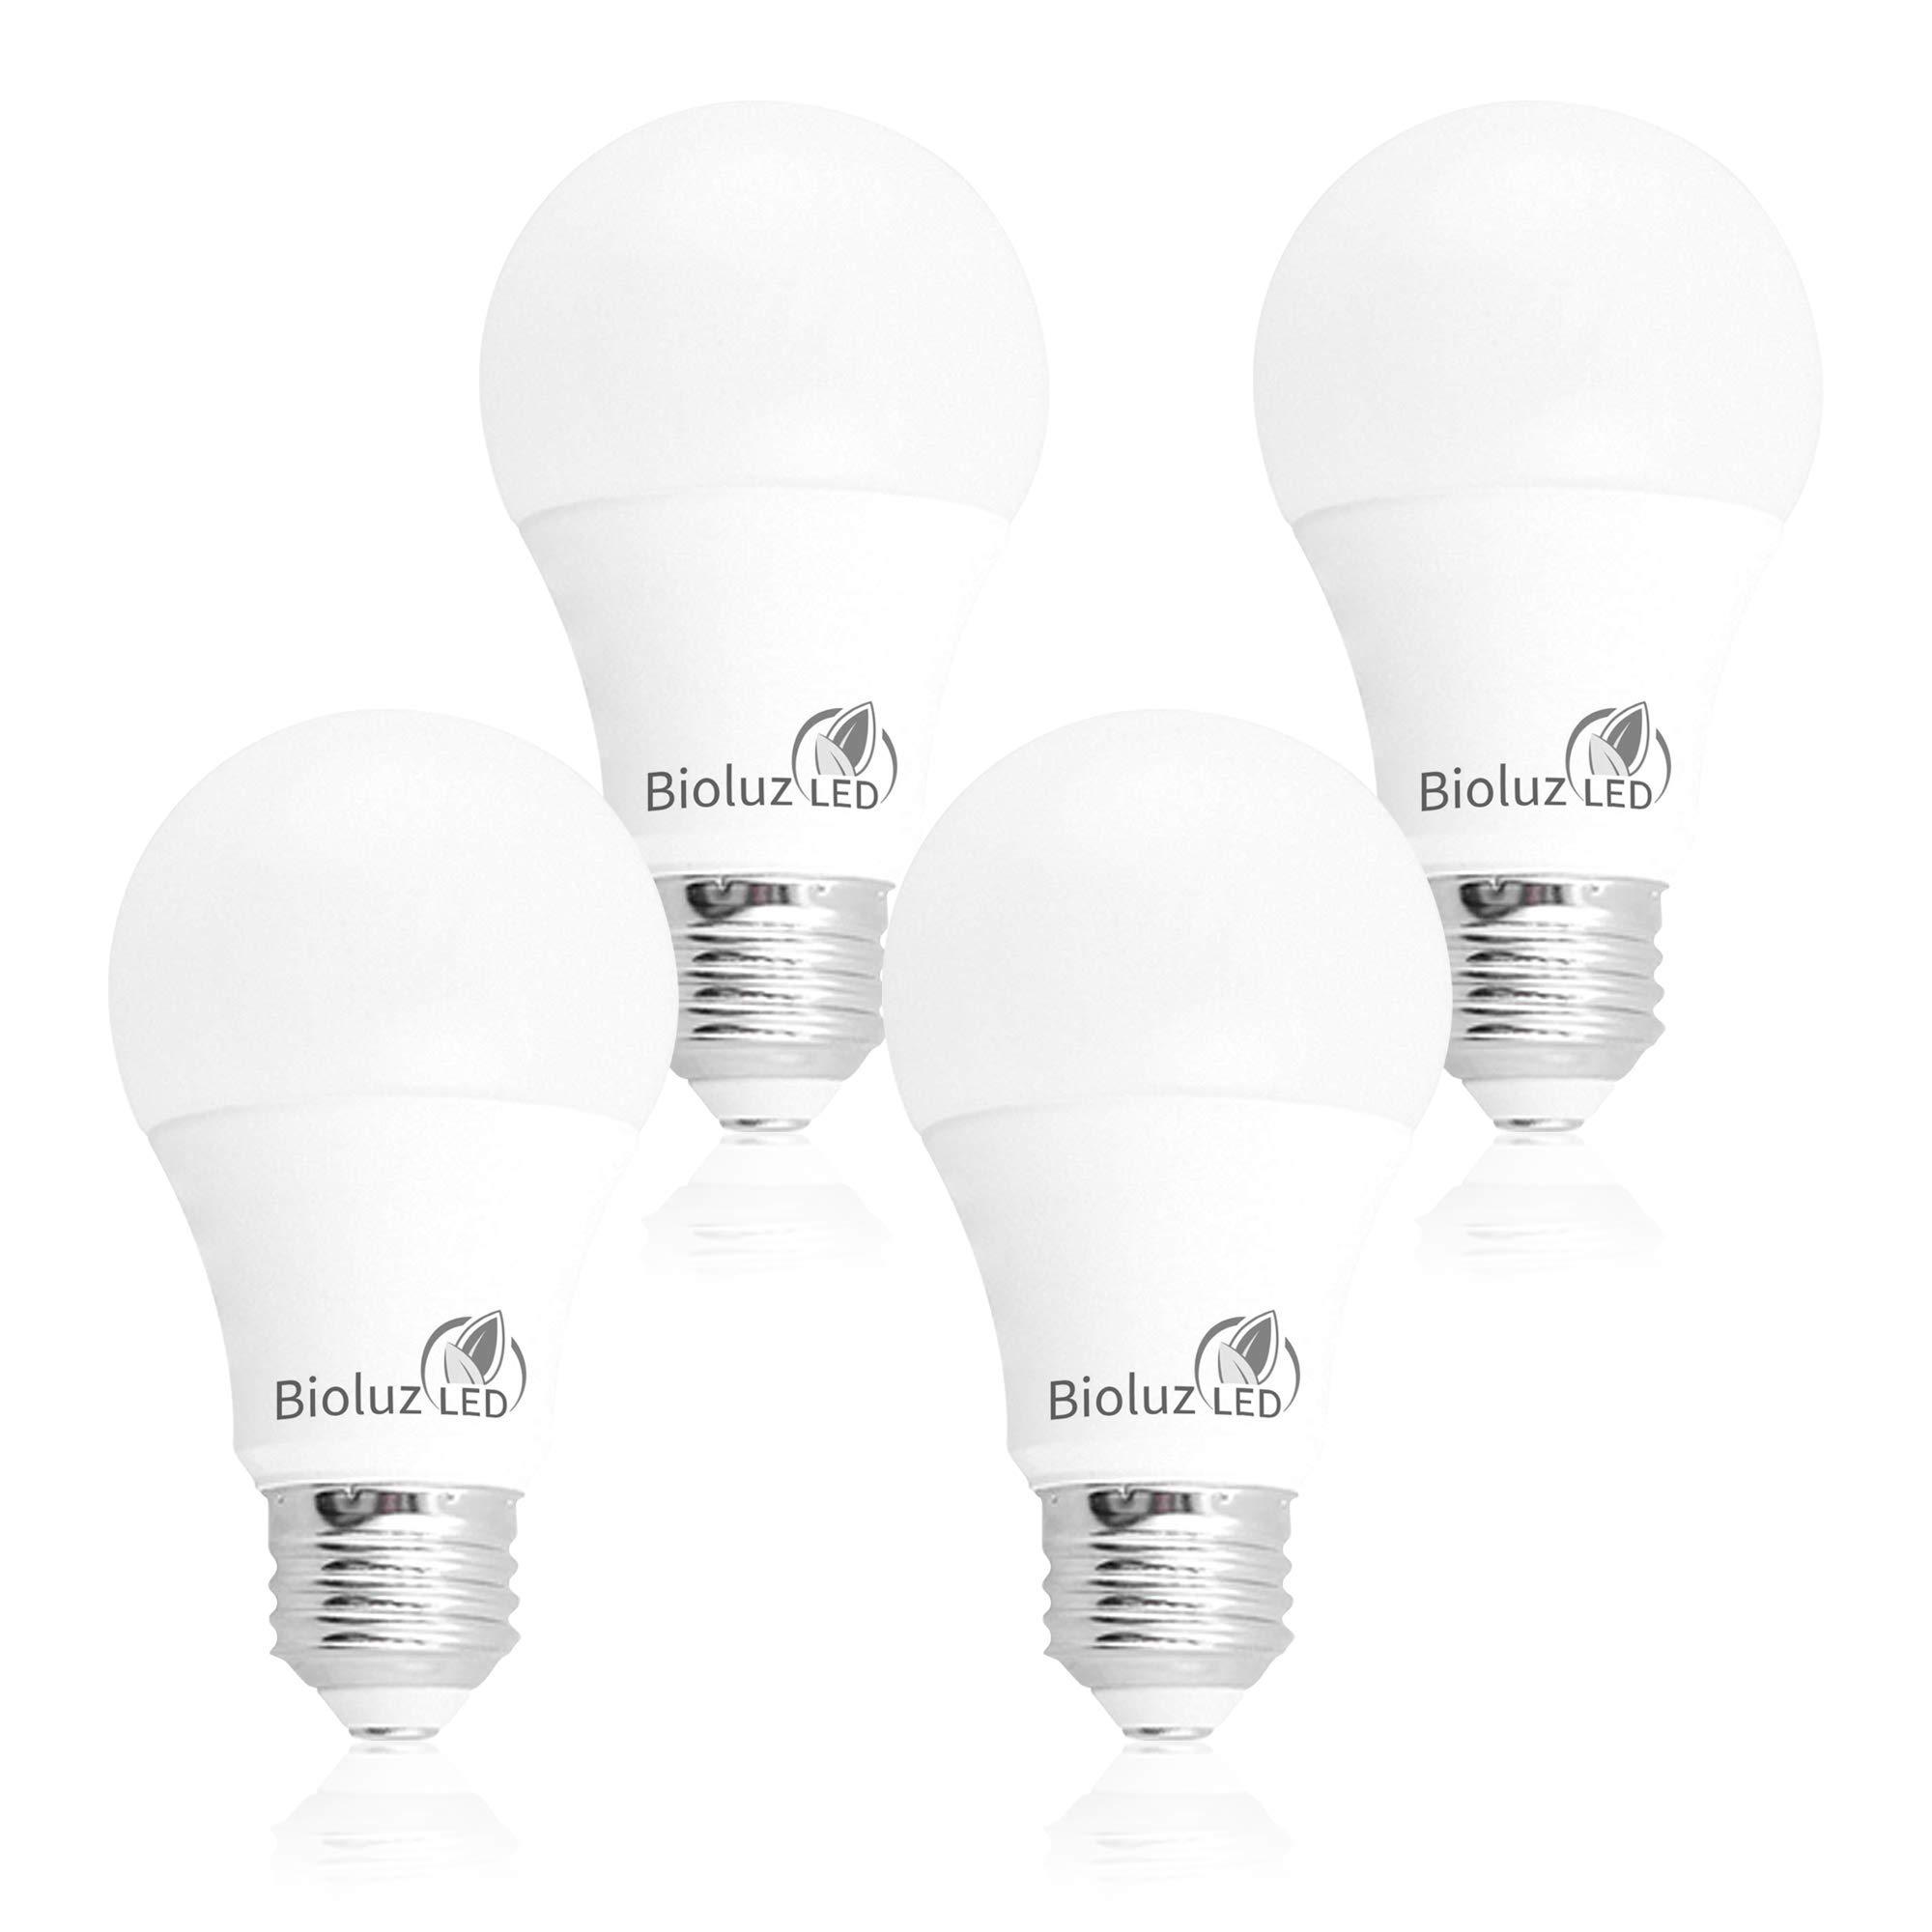 Bioluz Led 100w Dimmable Led Light Bulbs Soft White 3000k A19 Led Light Bulb 1600 Lumen 4 Pack Amazon Com